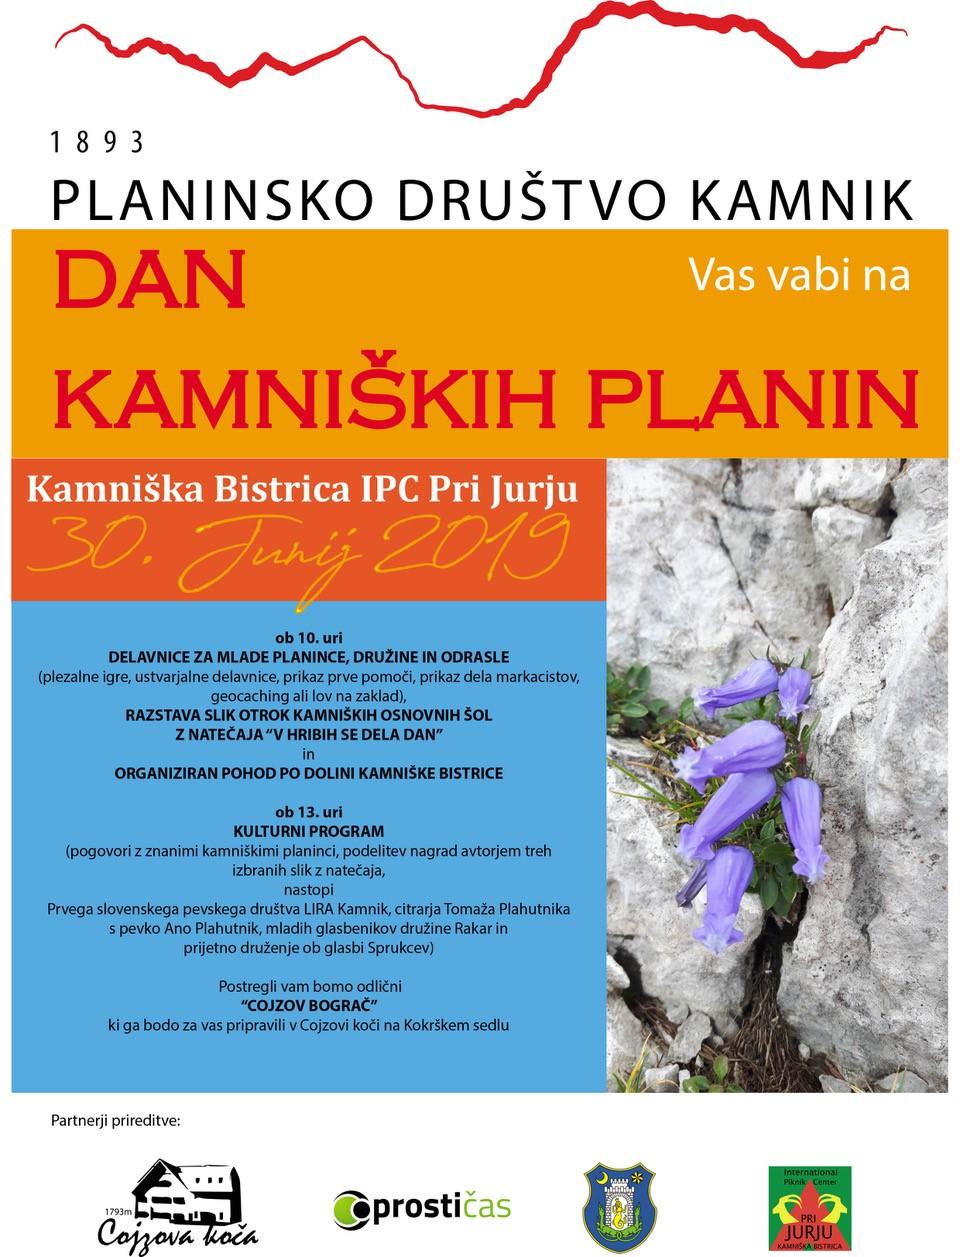 dan_kam_planin_19